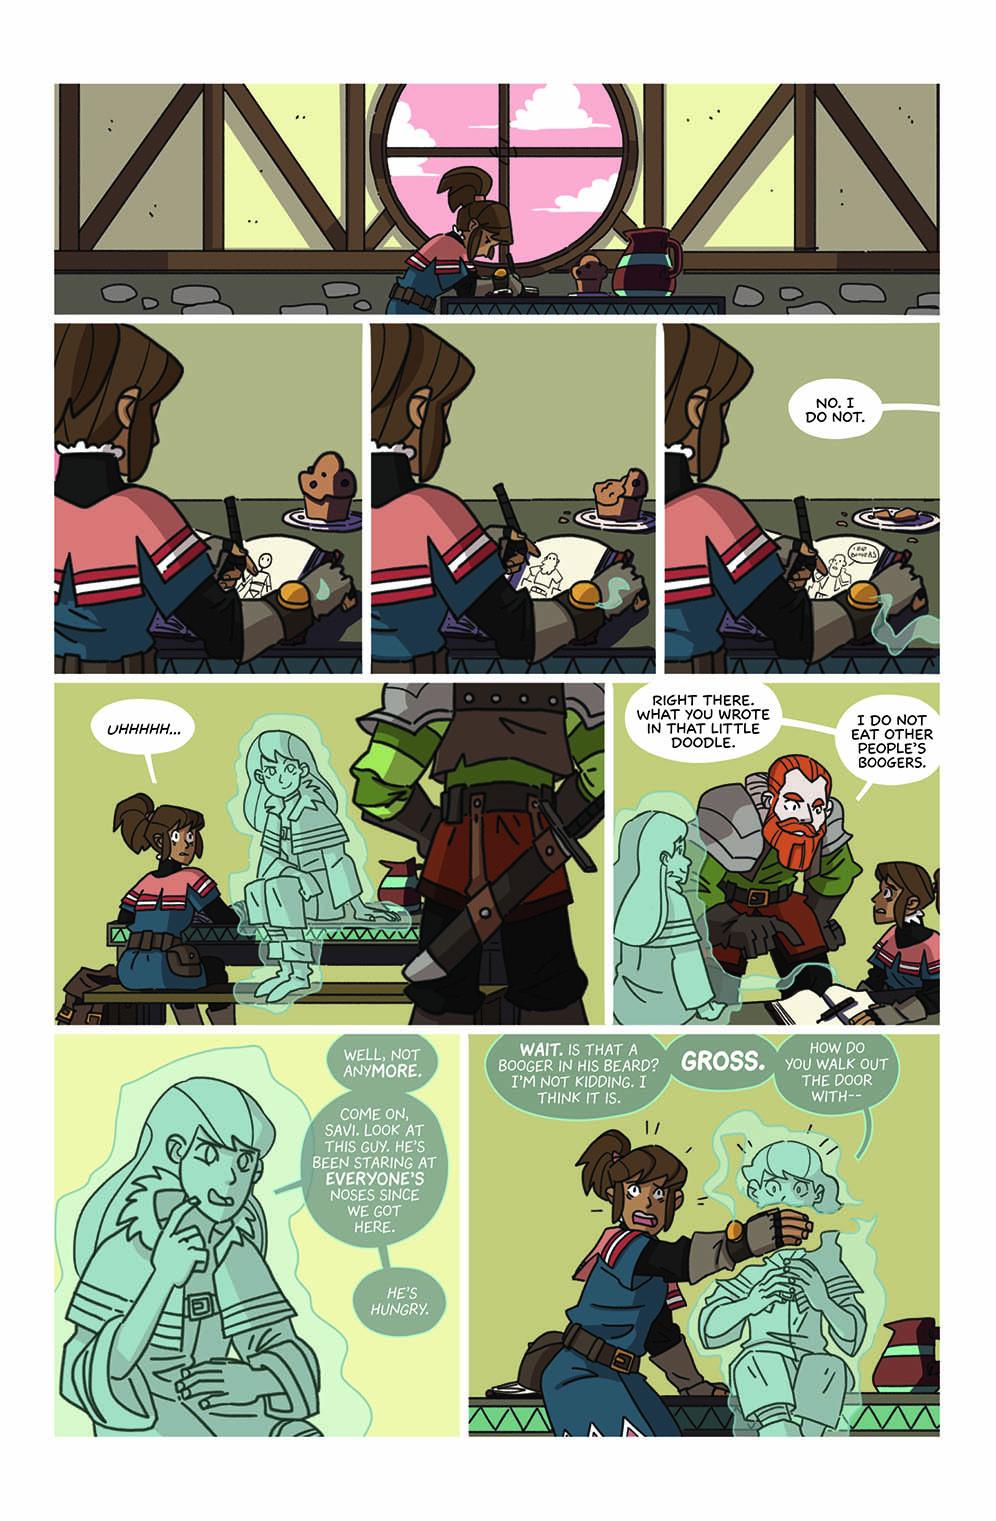 Memo - Page 1